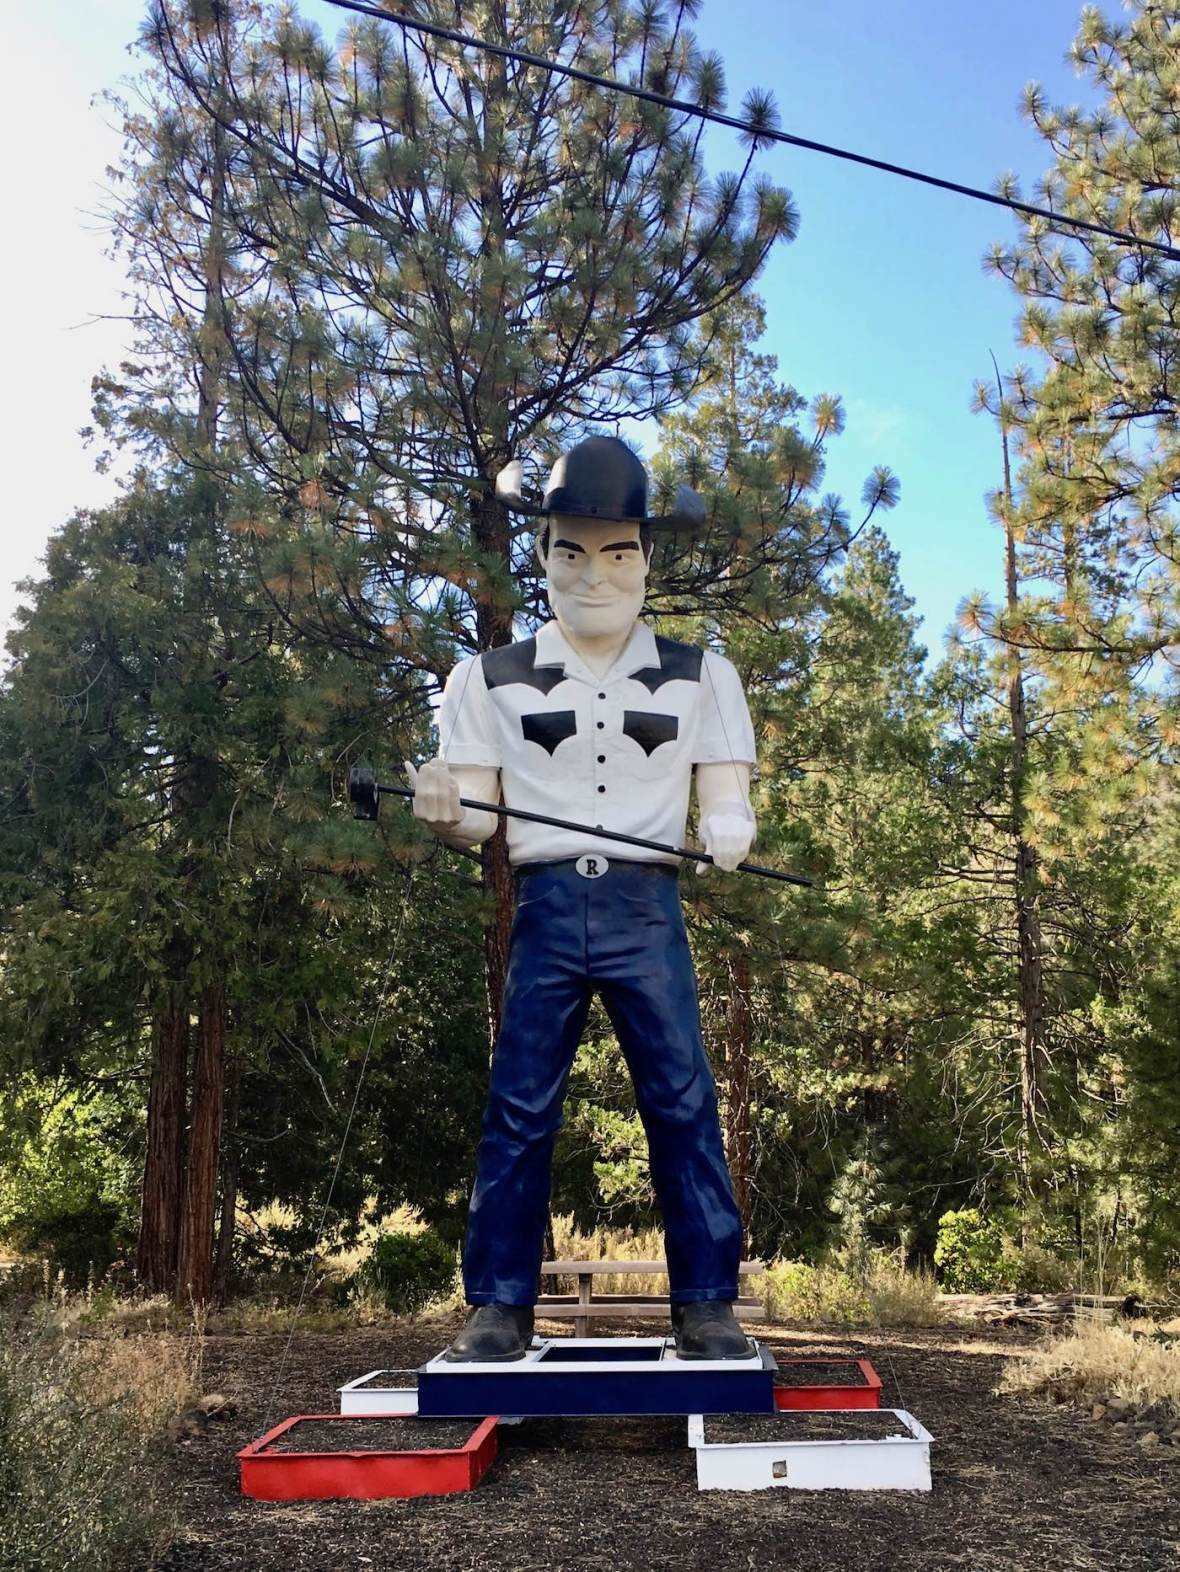 Giant cowboy statue near Lassen Volcanic National Park